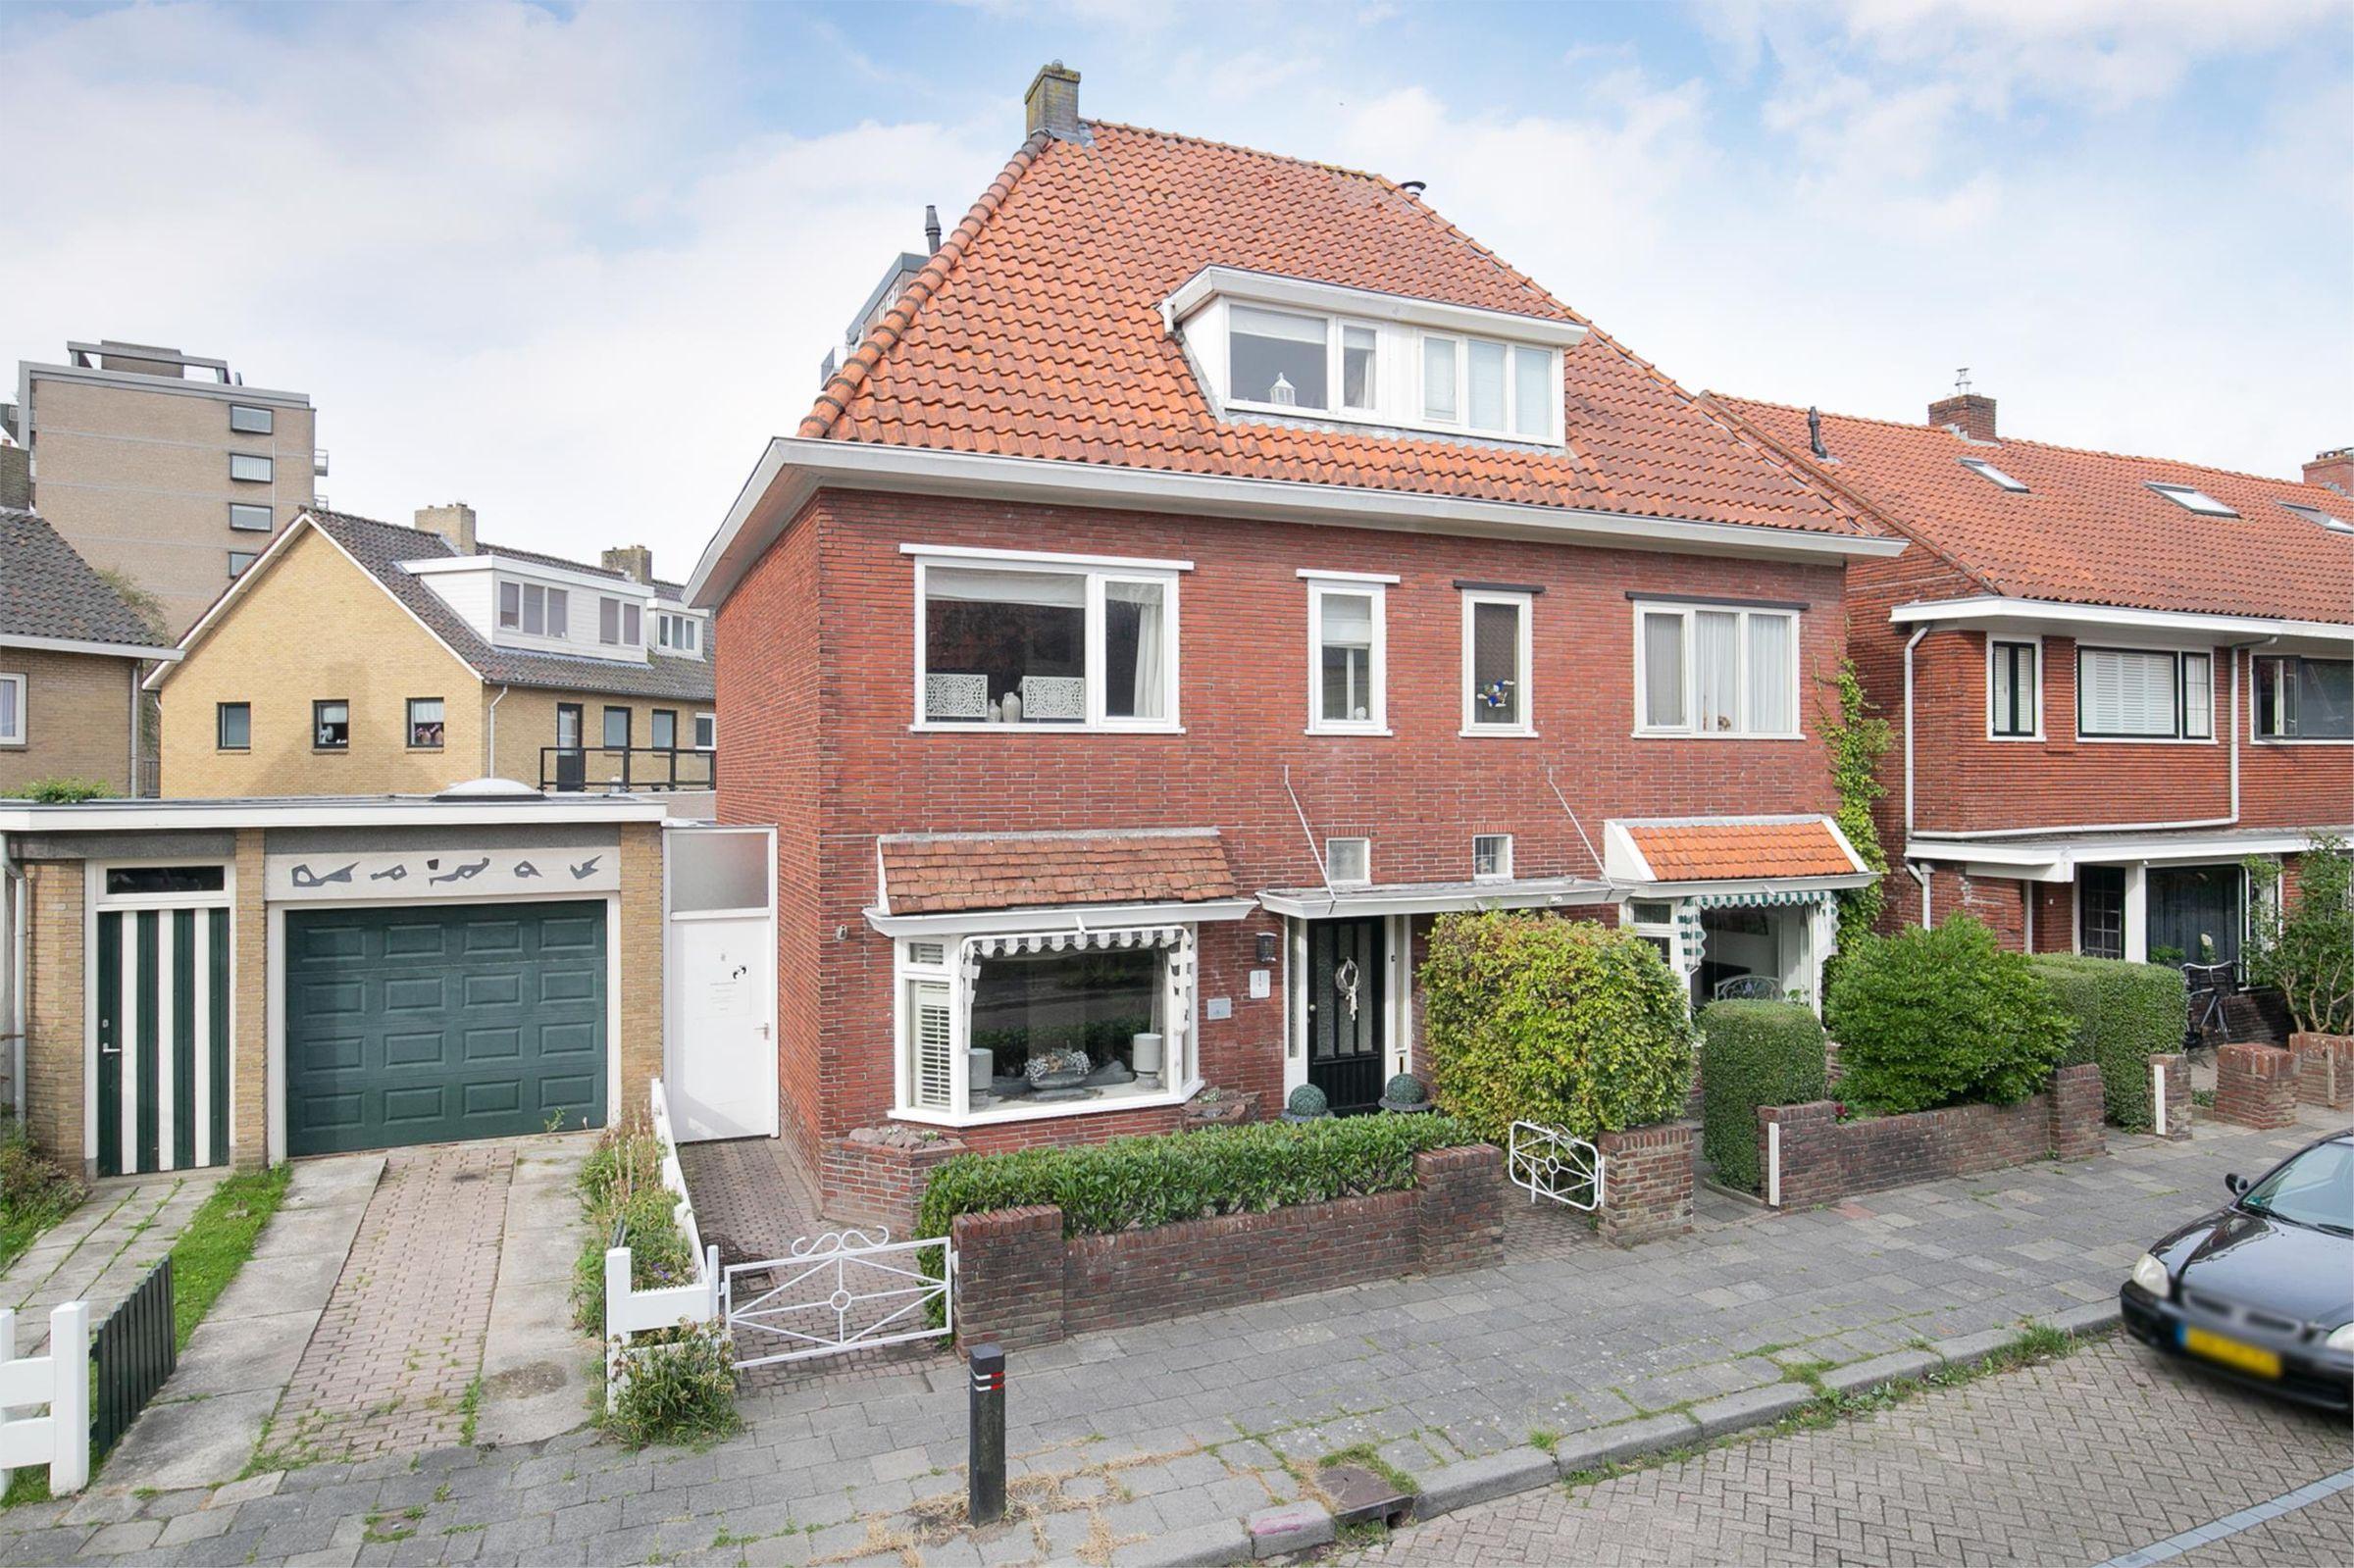 Sperwerstraat 1, Leeuwarden